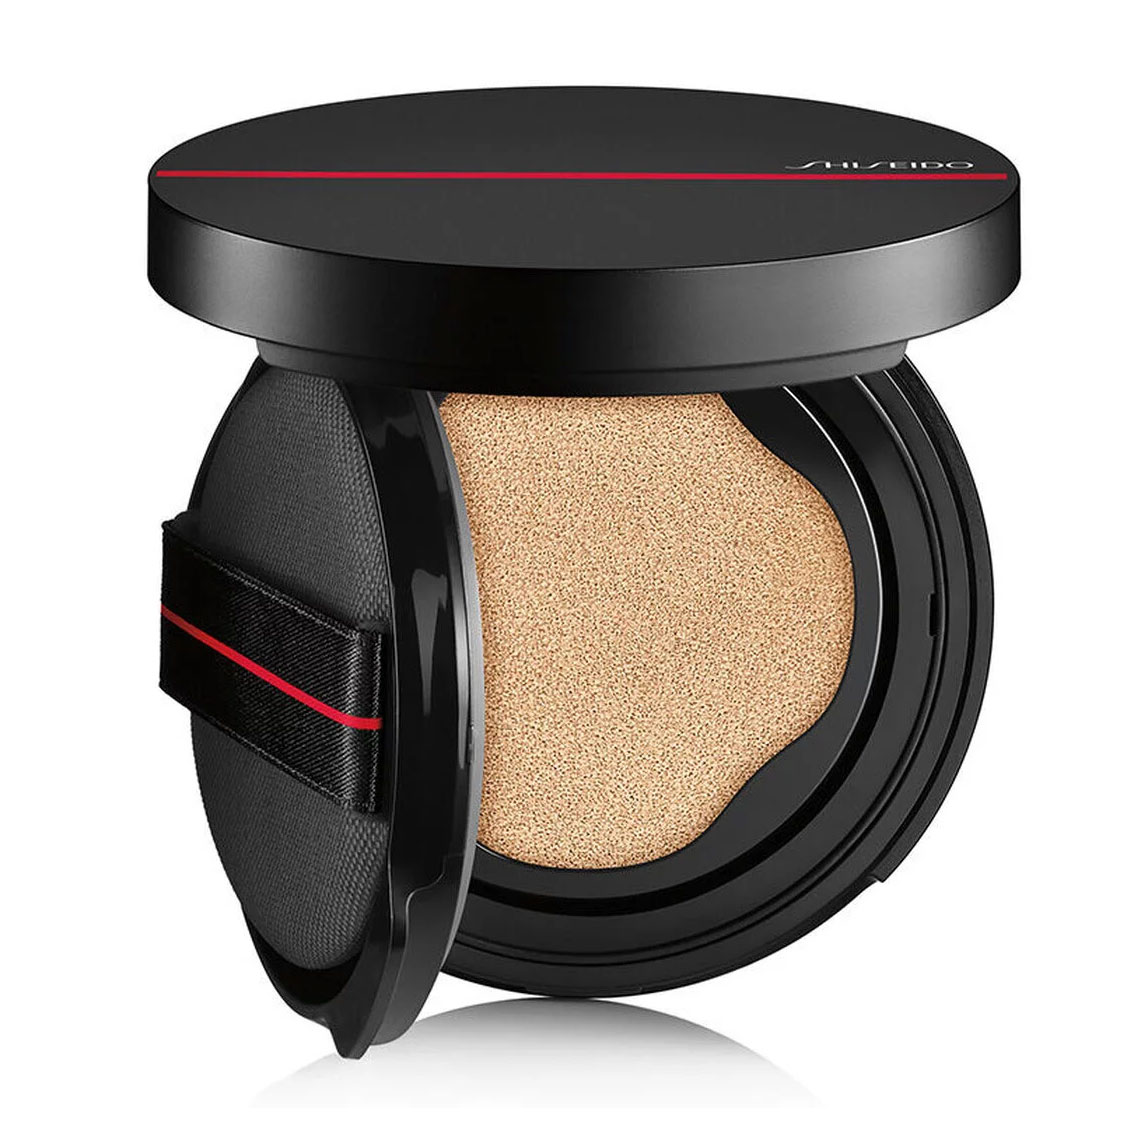 Shiseido Synchro Skin Self Refreshing Cushion Compact n. 220 linen